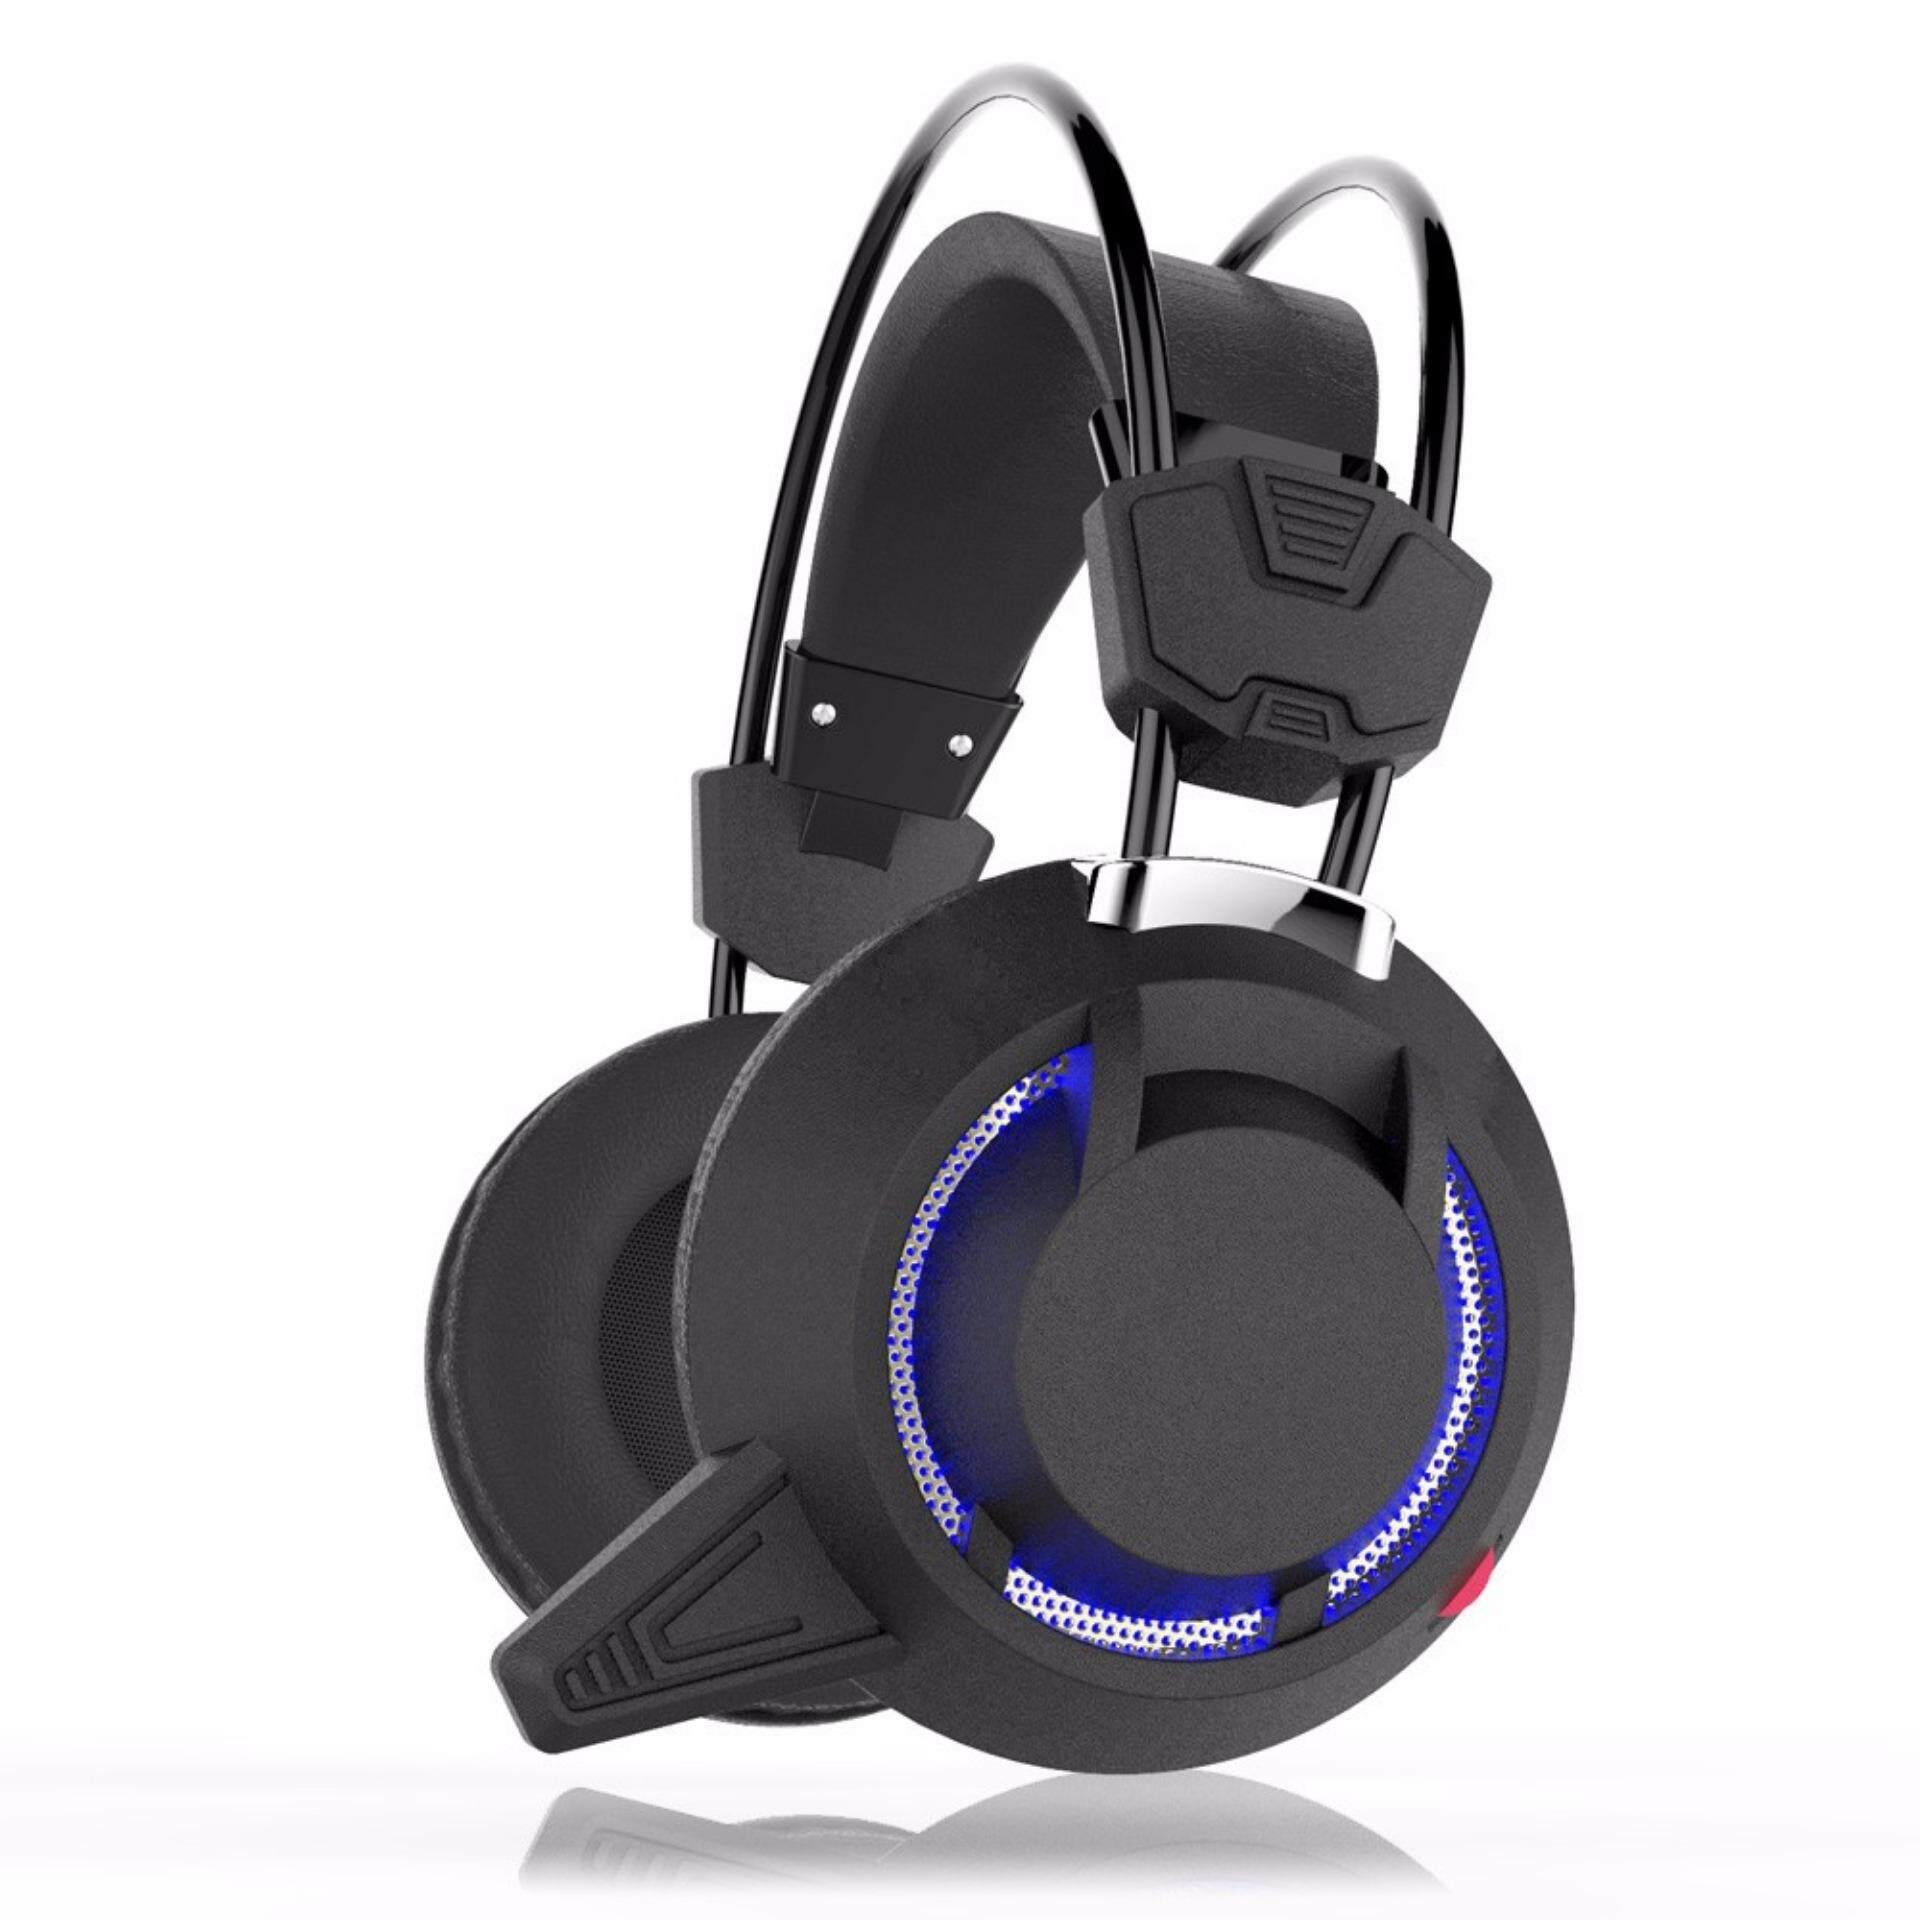 Fitur Rexus Headset Gaming Vonix F26 F 26 Headphone Head Set A Mio Flash In Protable Audio Earphone